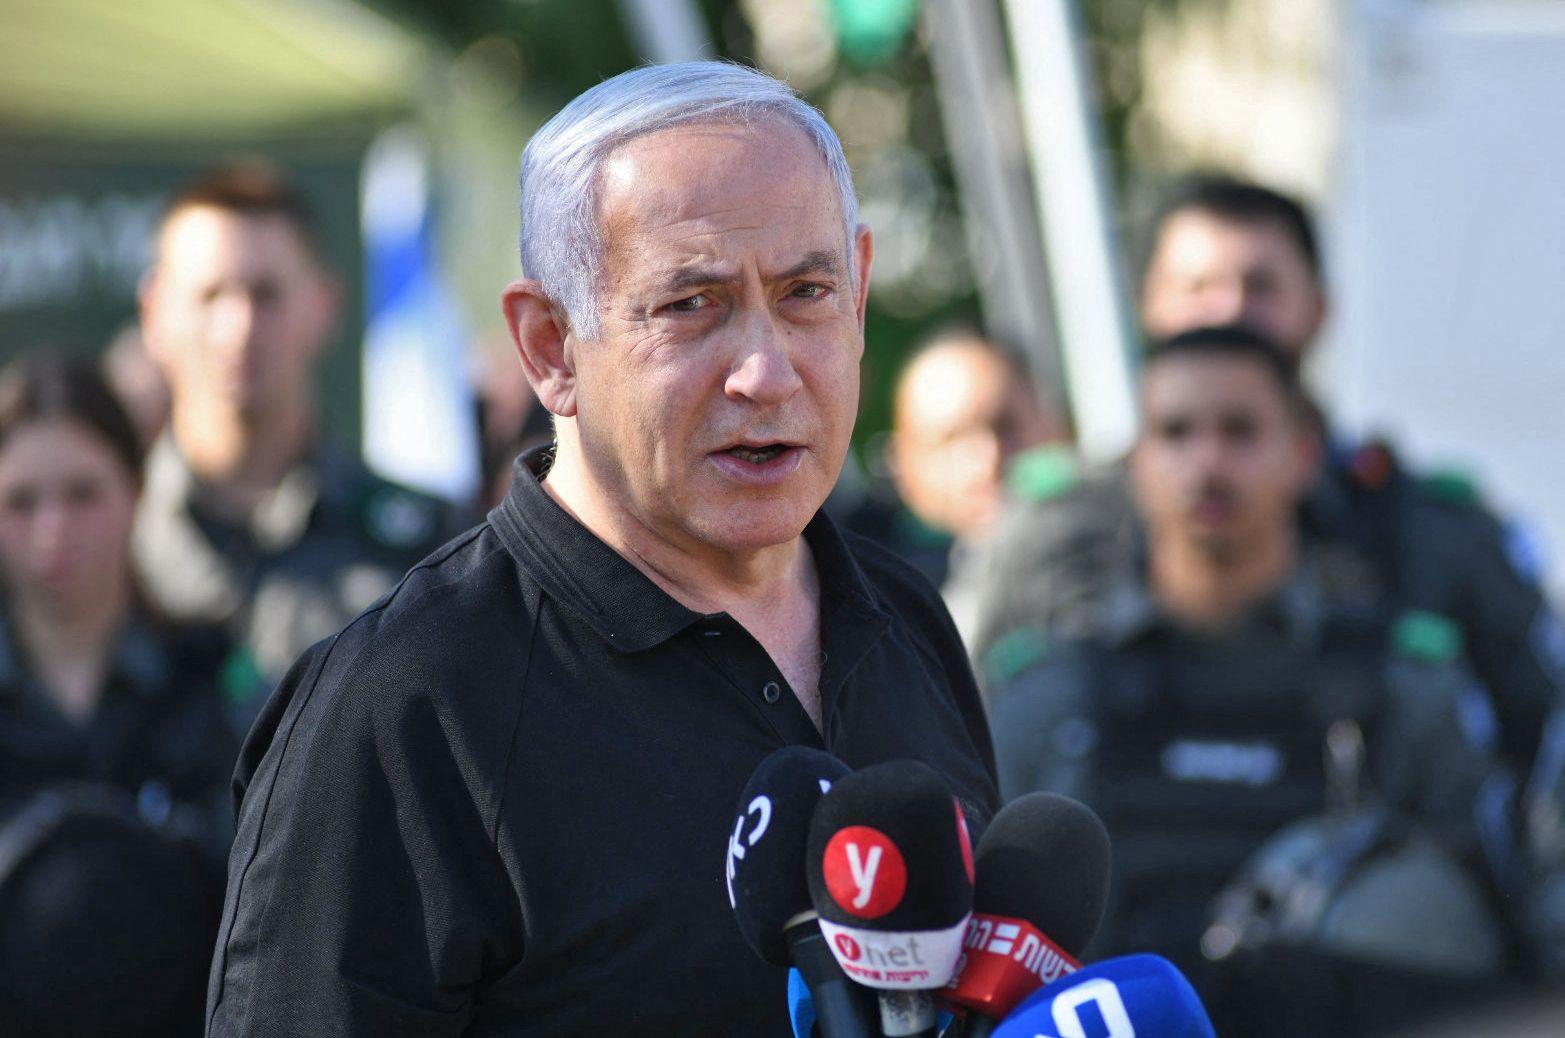 ISRAEL-POLITICS-CONFLICT-PALESTINIAN